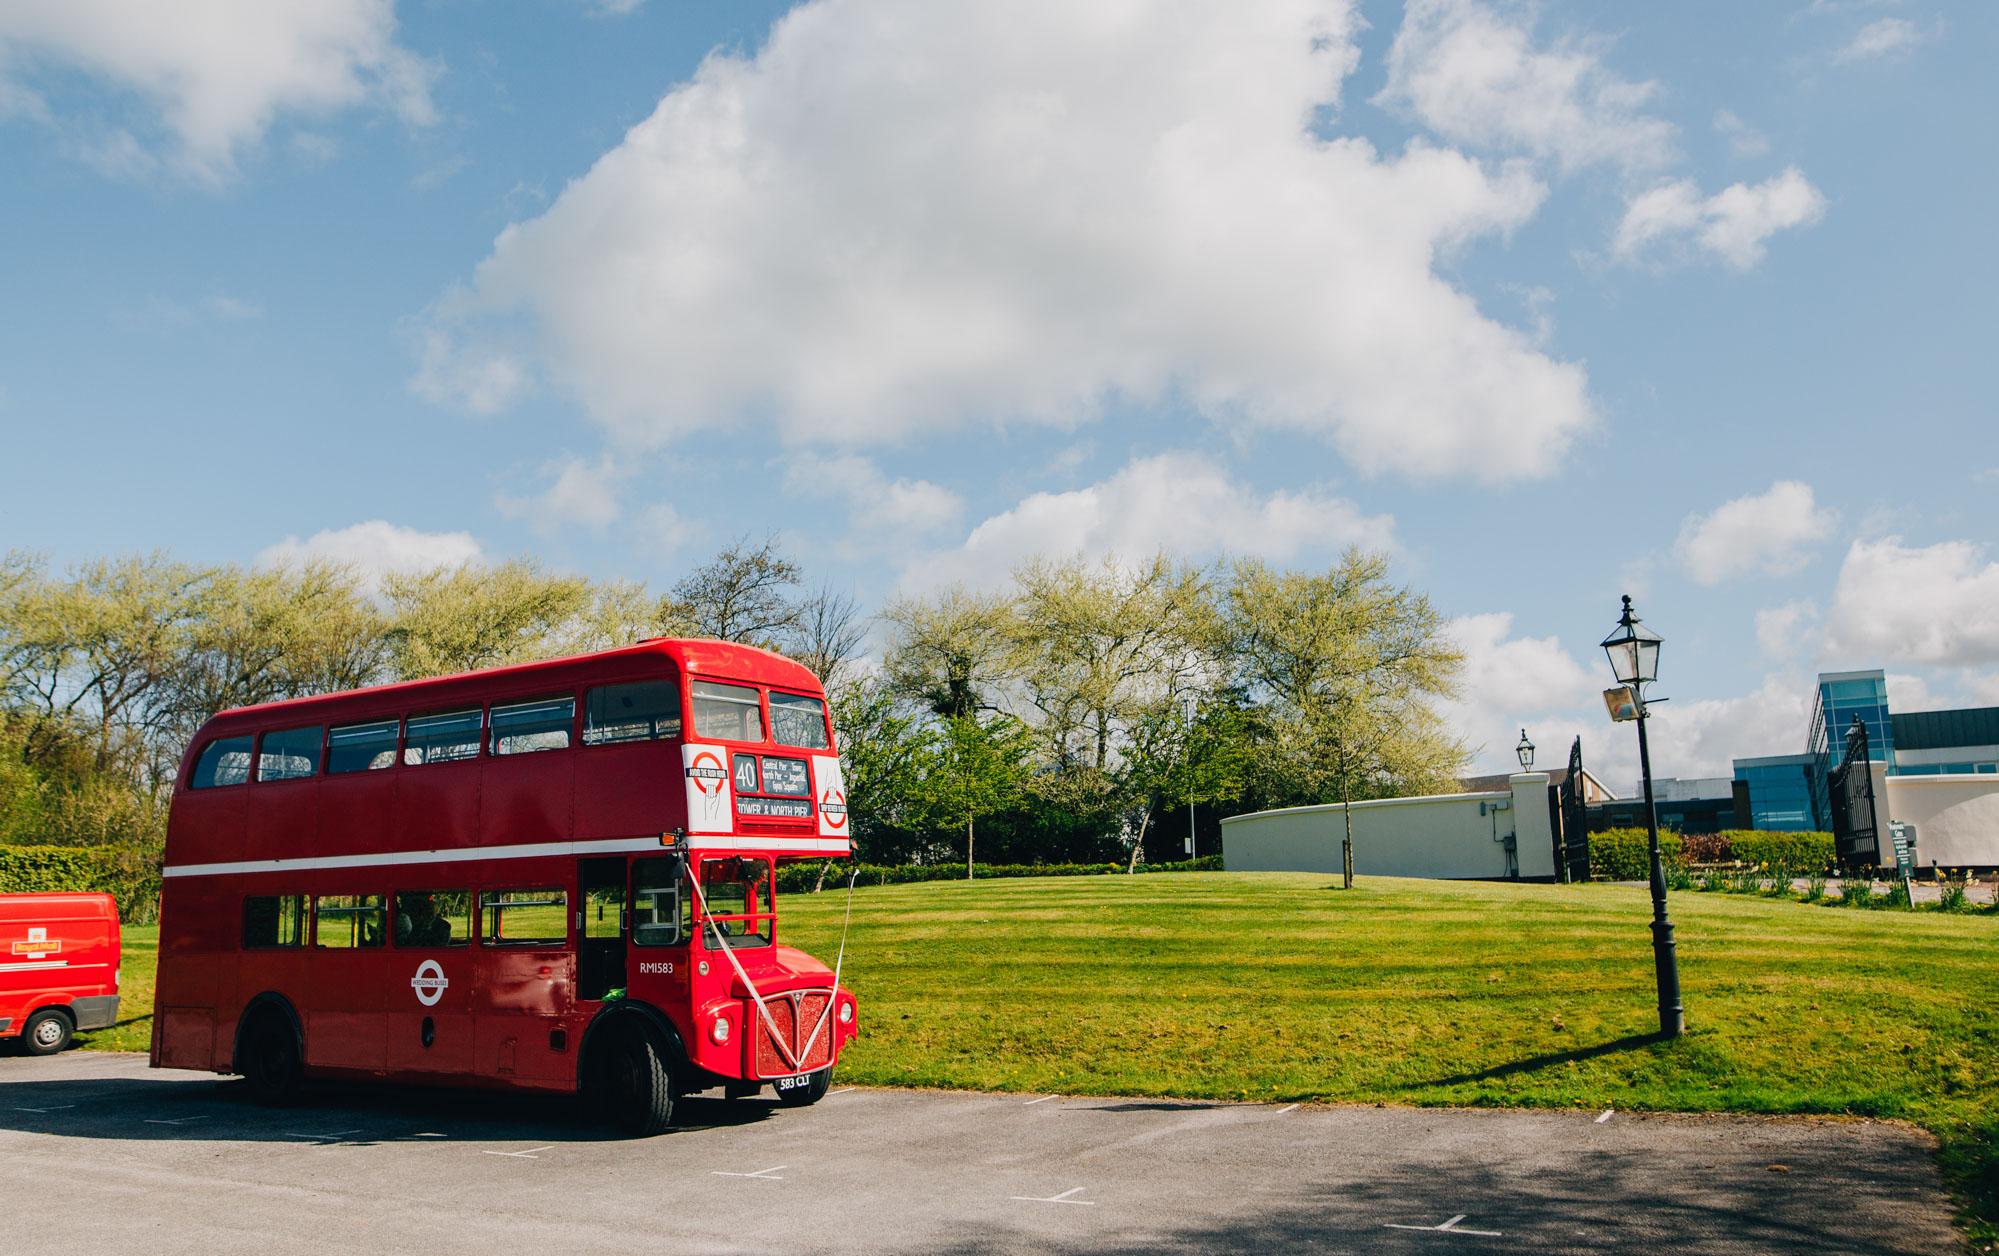 vintage red bus - Lancaster wedding